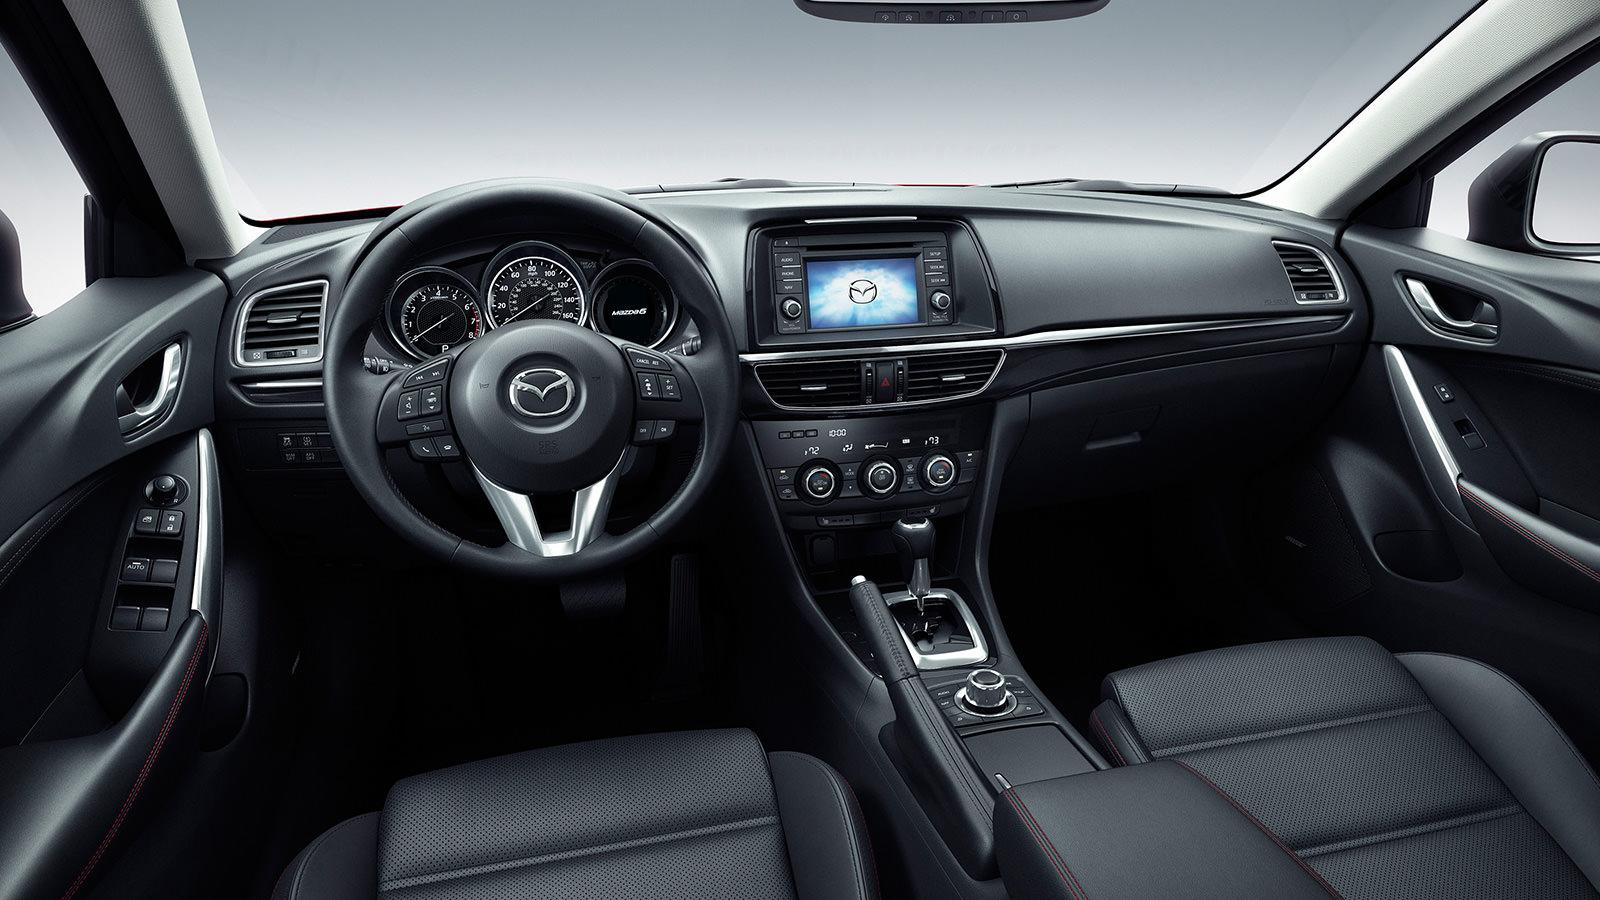 Top 10 Car Interiors Under 35 000